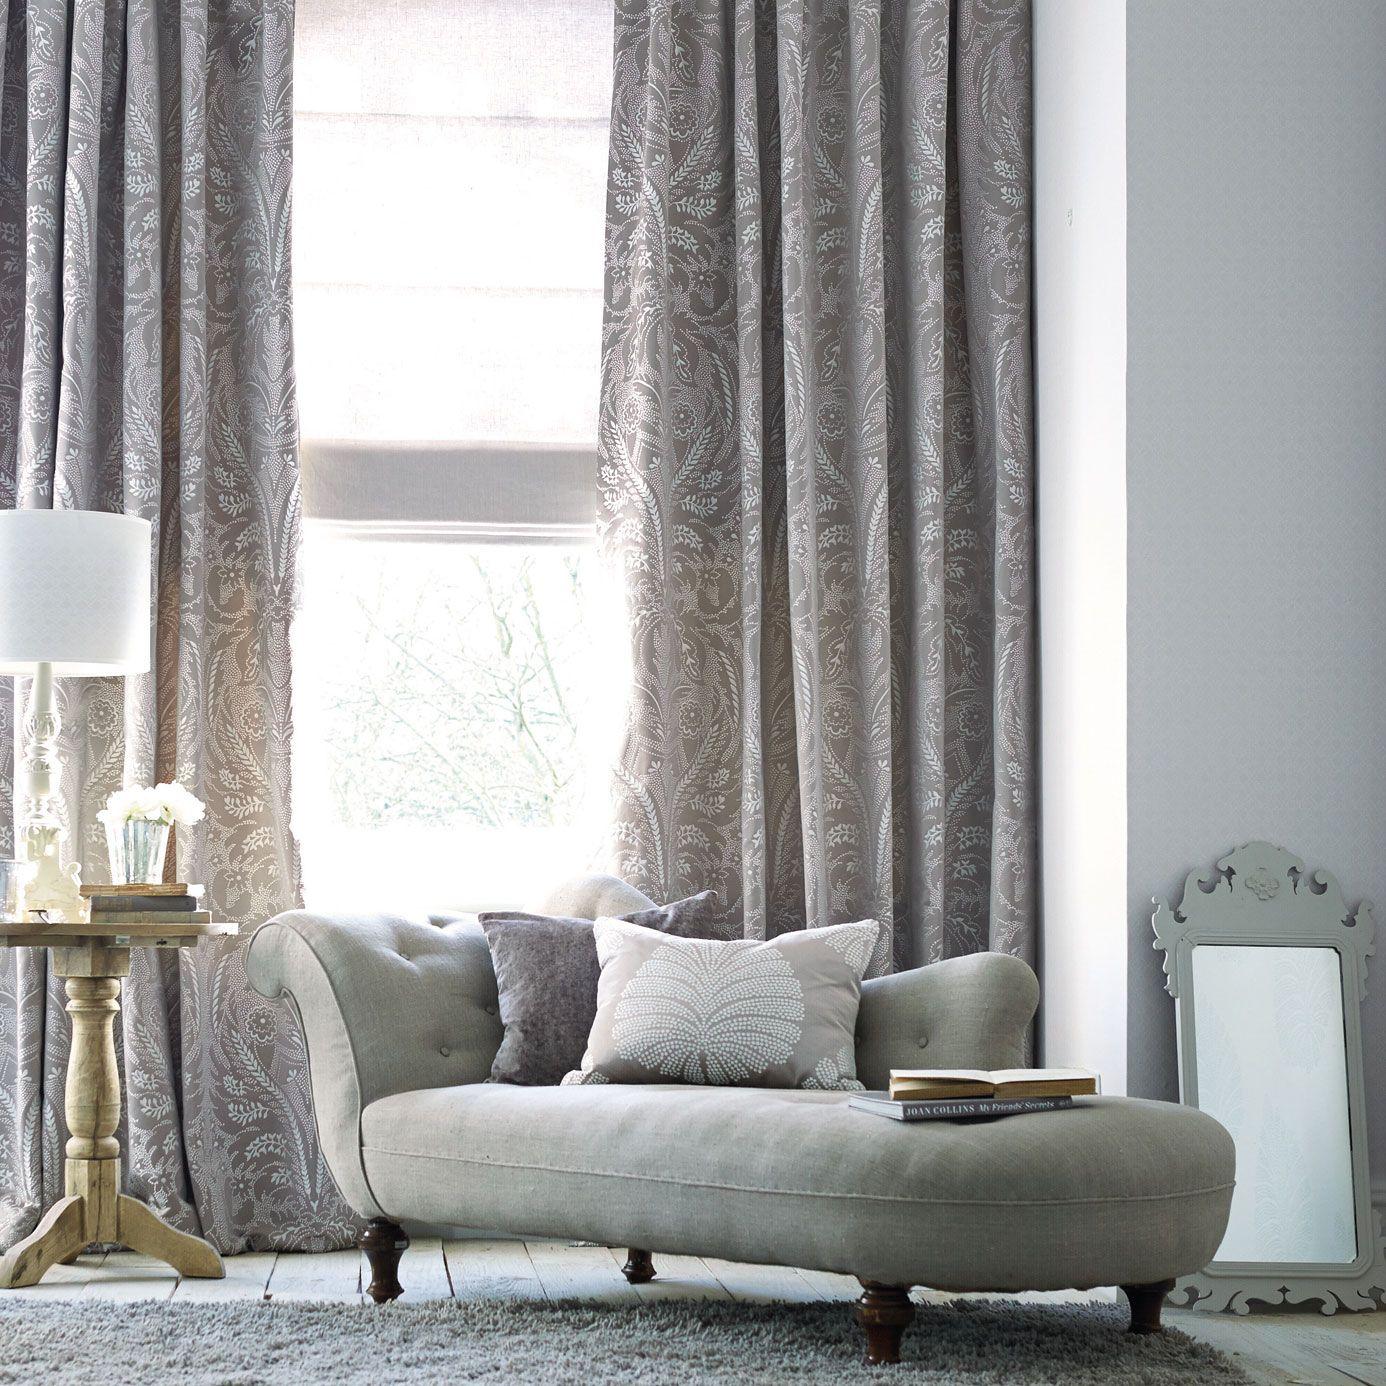 Products harlequin designer fabrics and wallpapers paradise - Products Harlequin Designer Fabrics And Wallpapers Florence Hwhi131548 Purity Fabrics